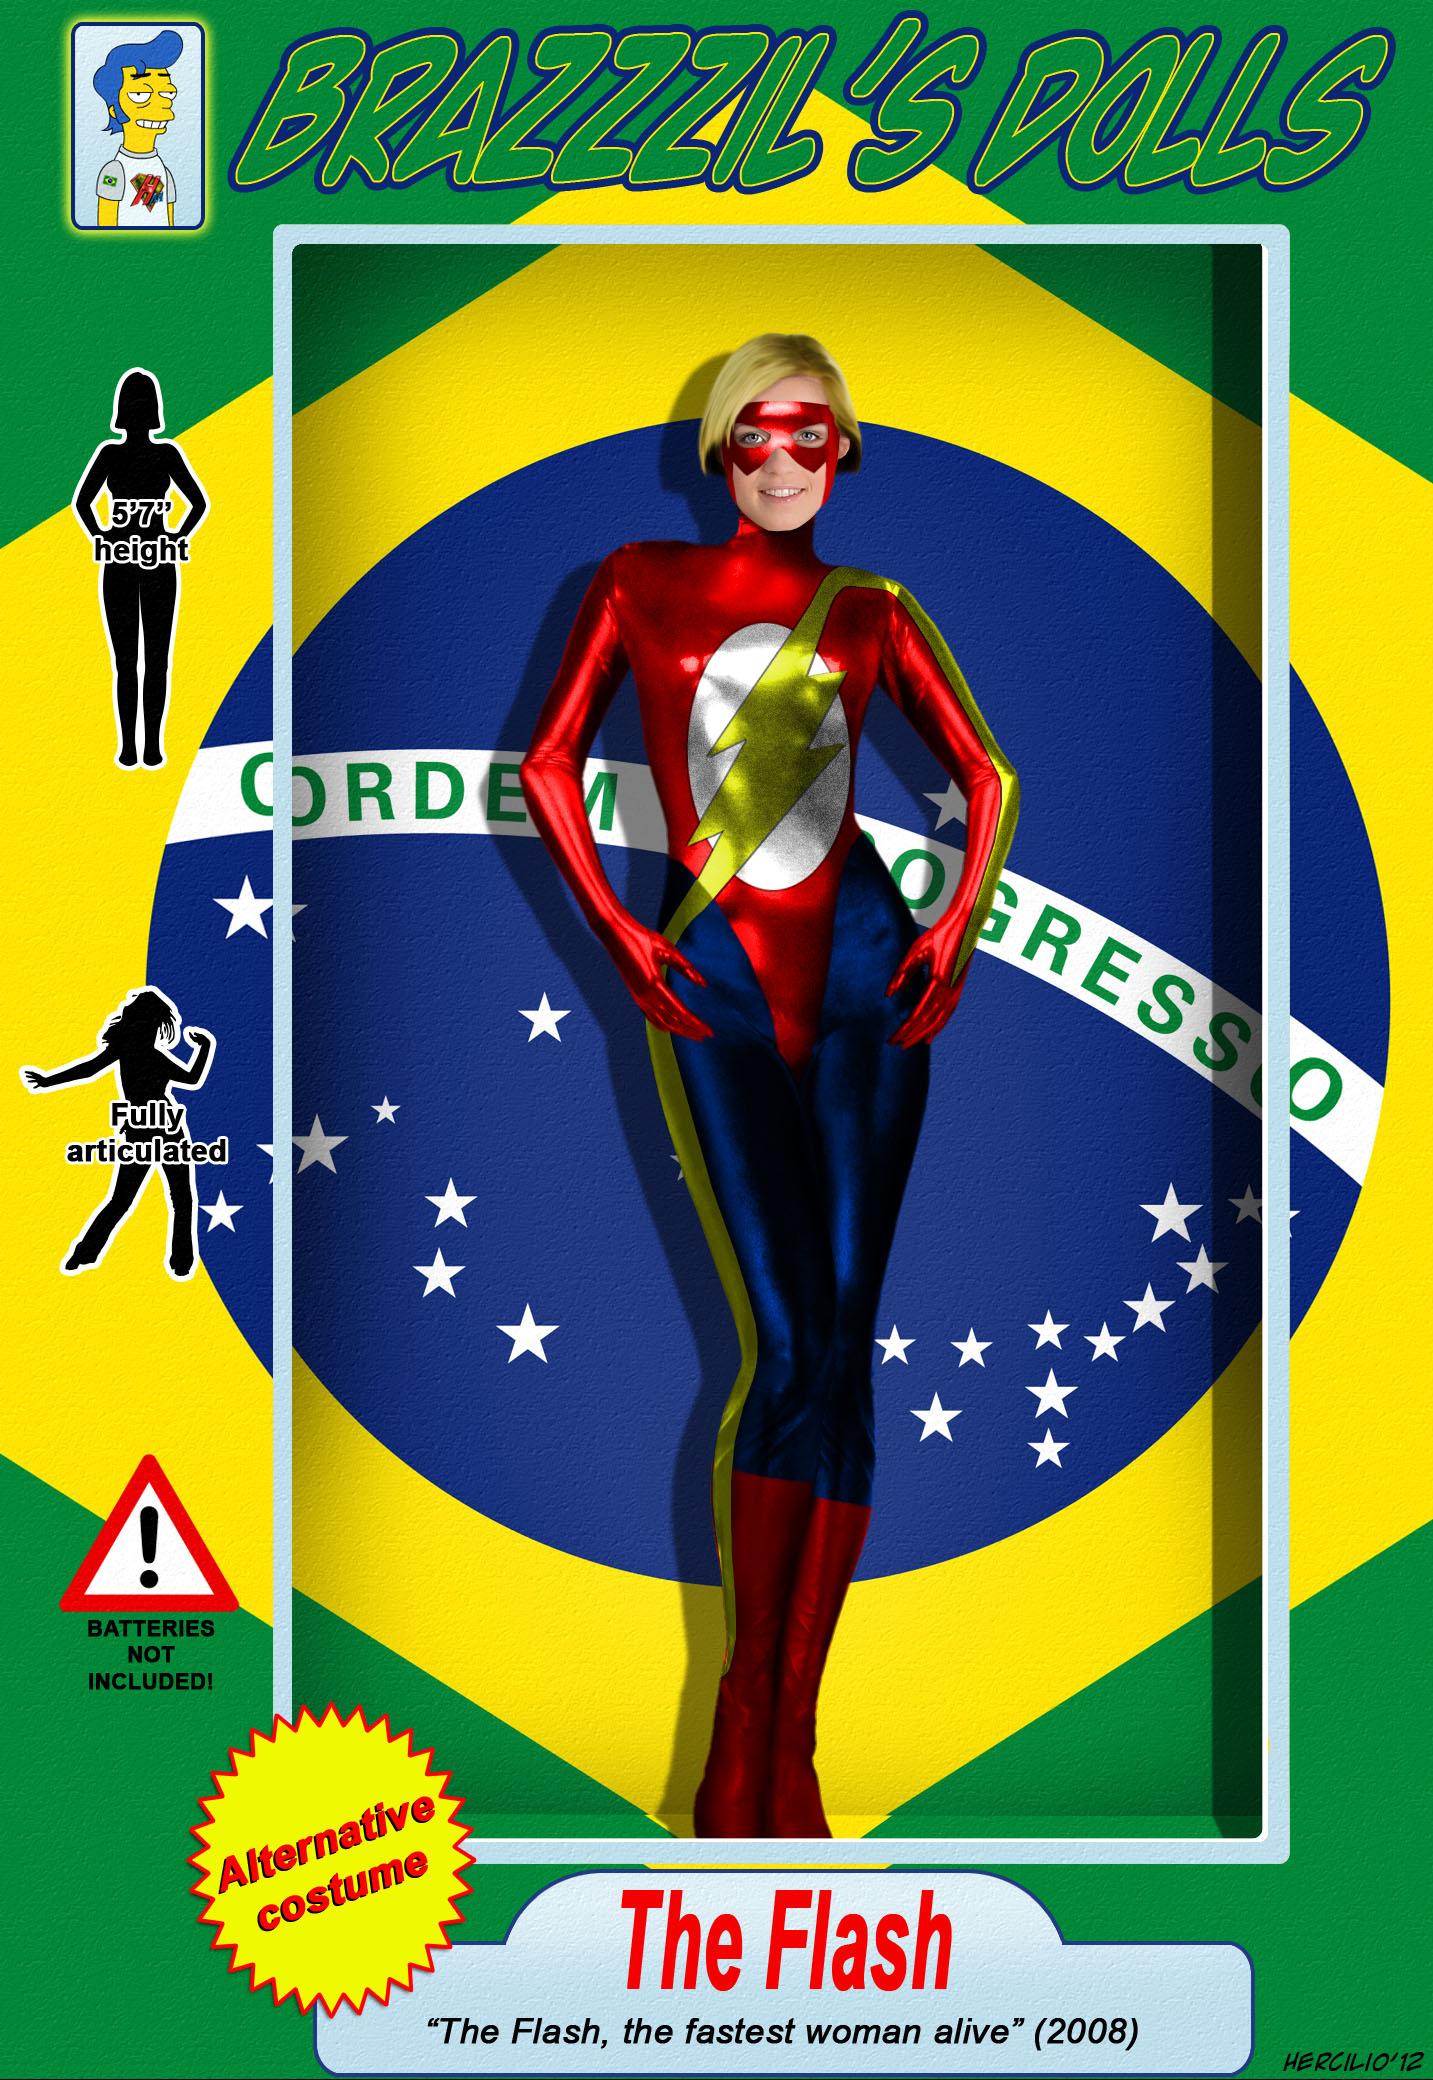 BRaZZZil's Dolls 7.1 - The Flash, Alternative Costume